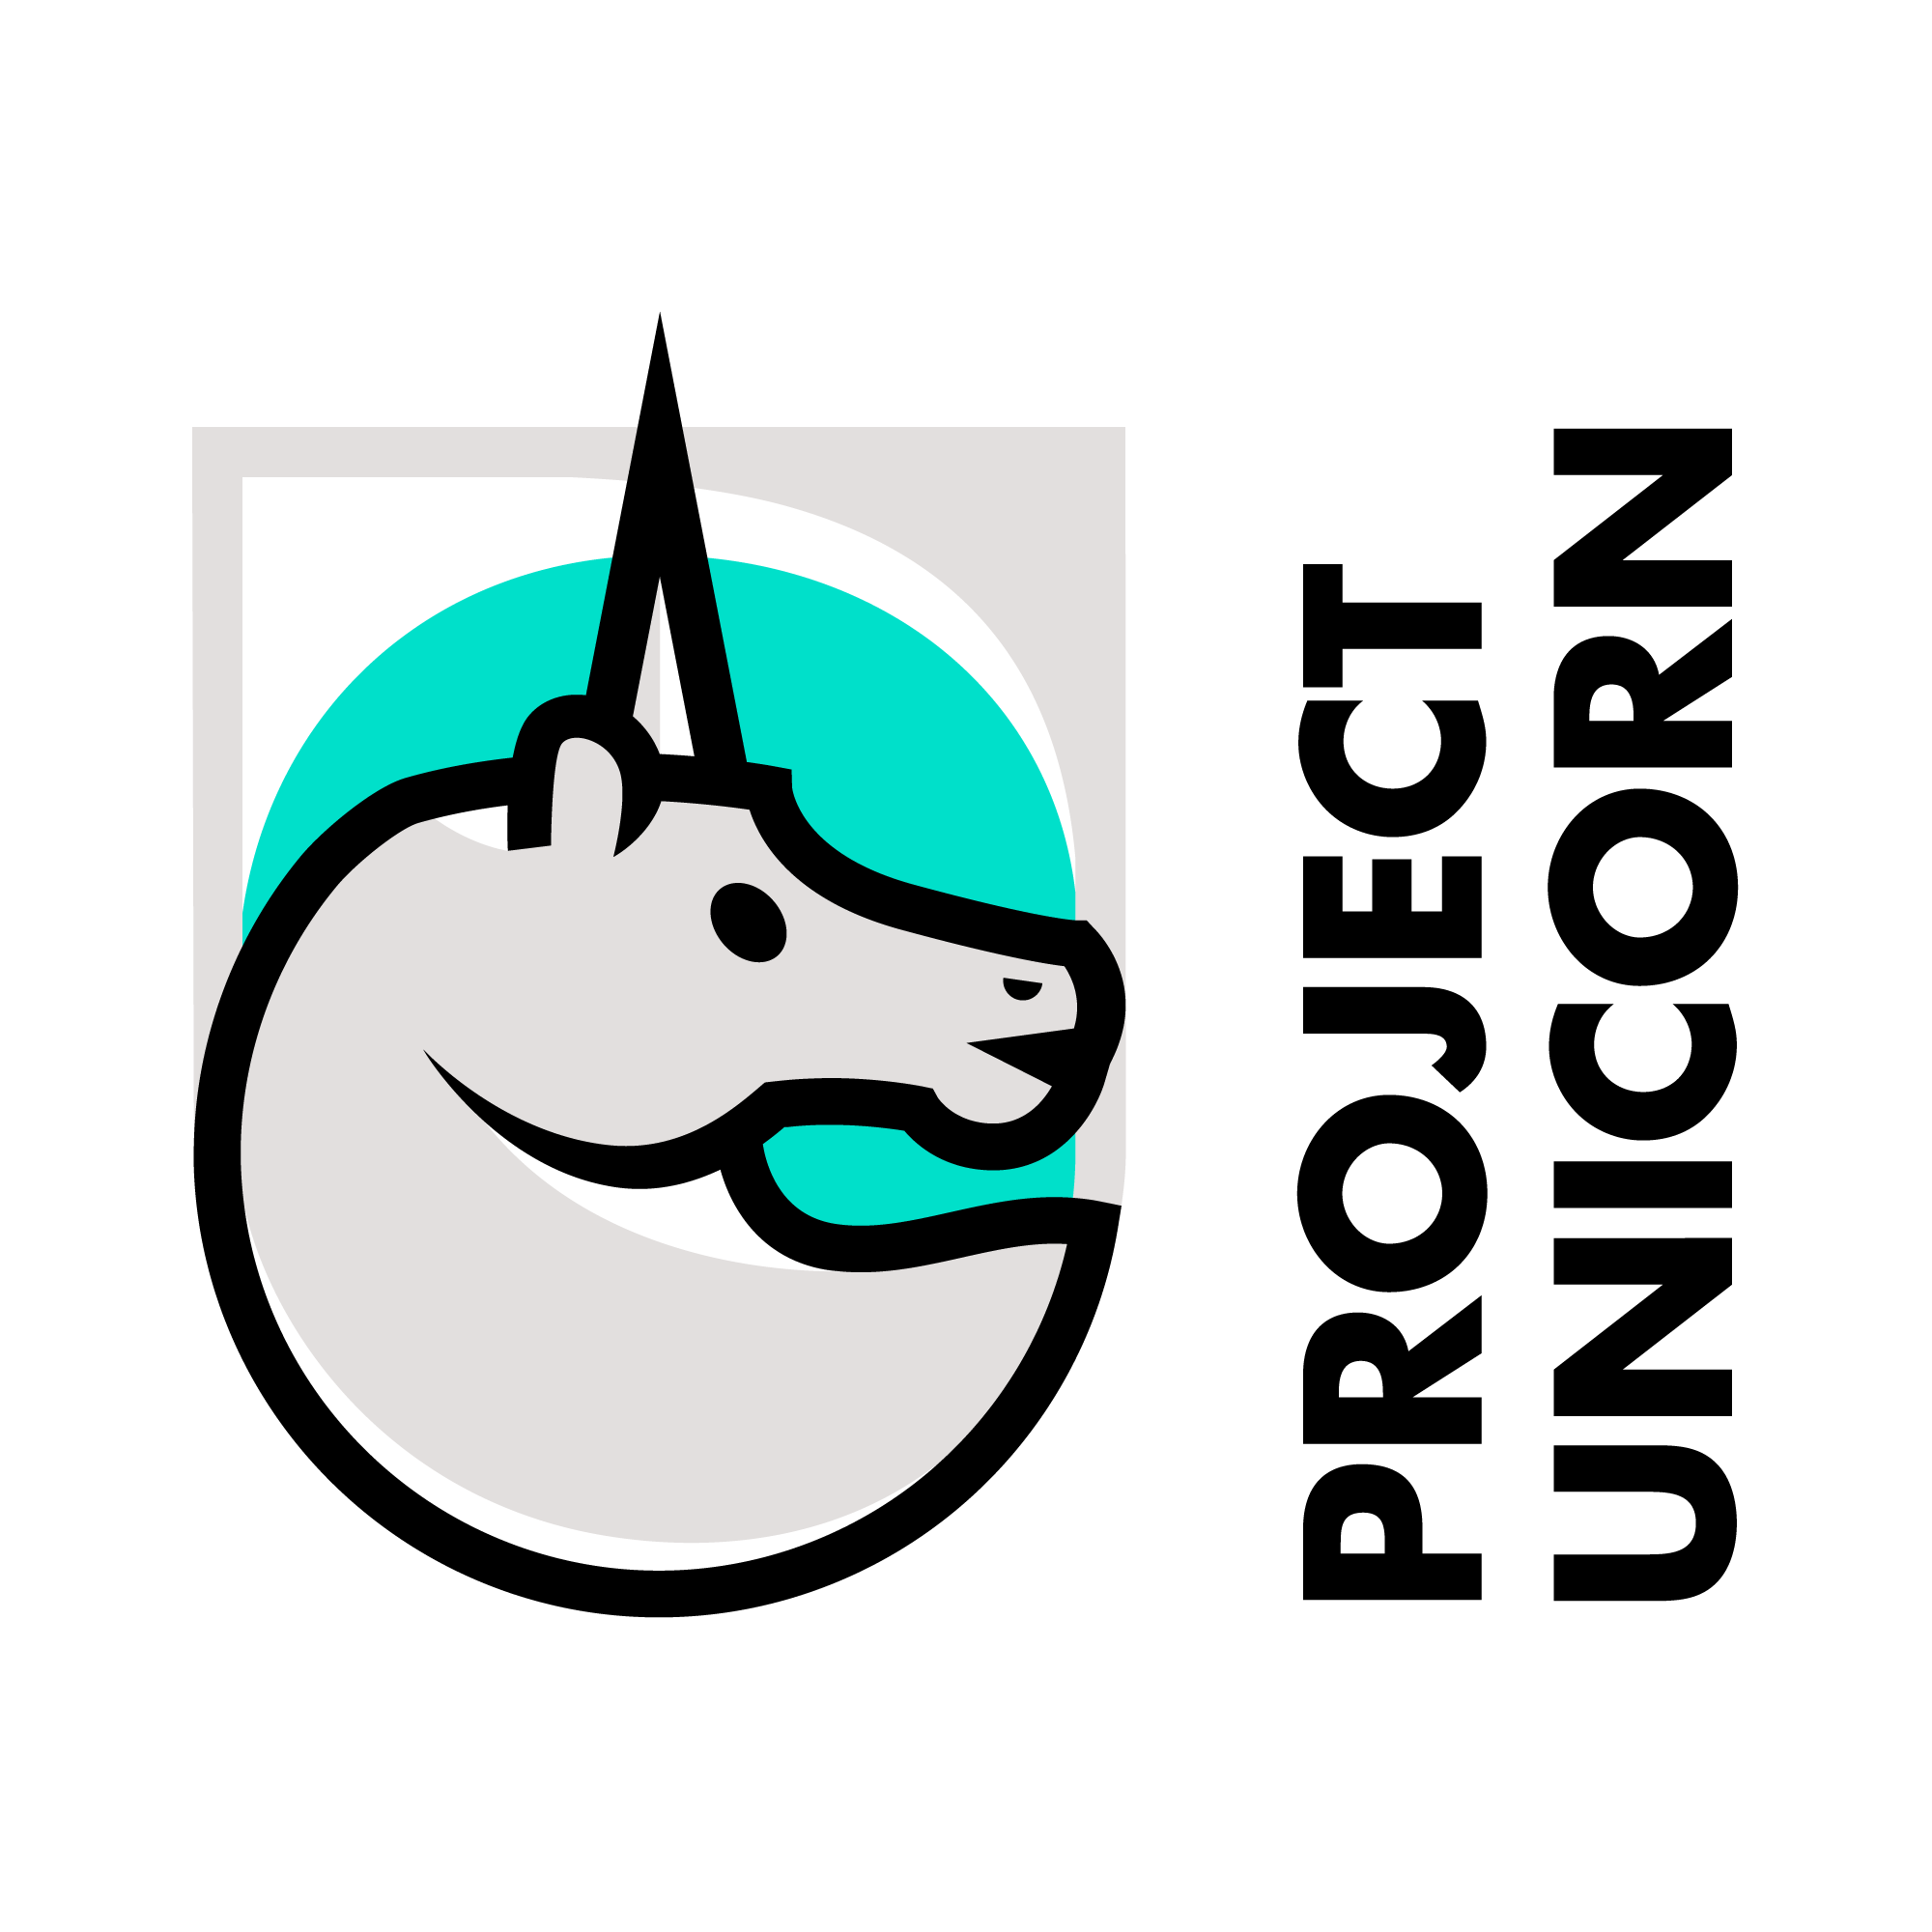 ProjectUnicorn_Logos_RGB_4 (1).png